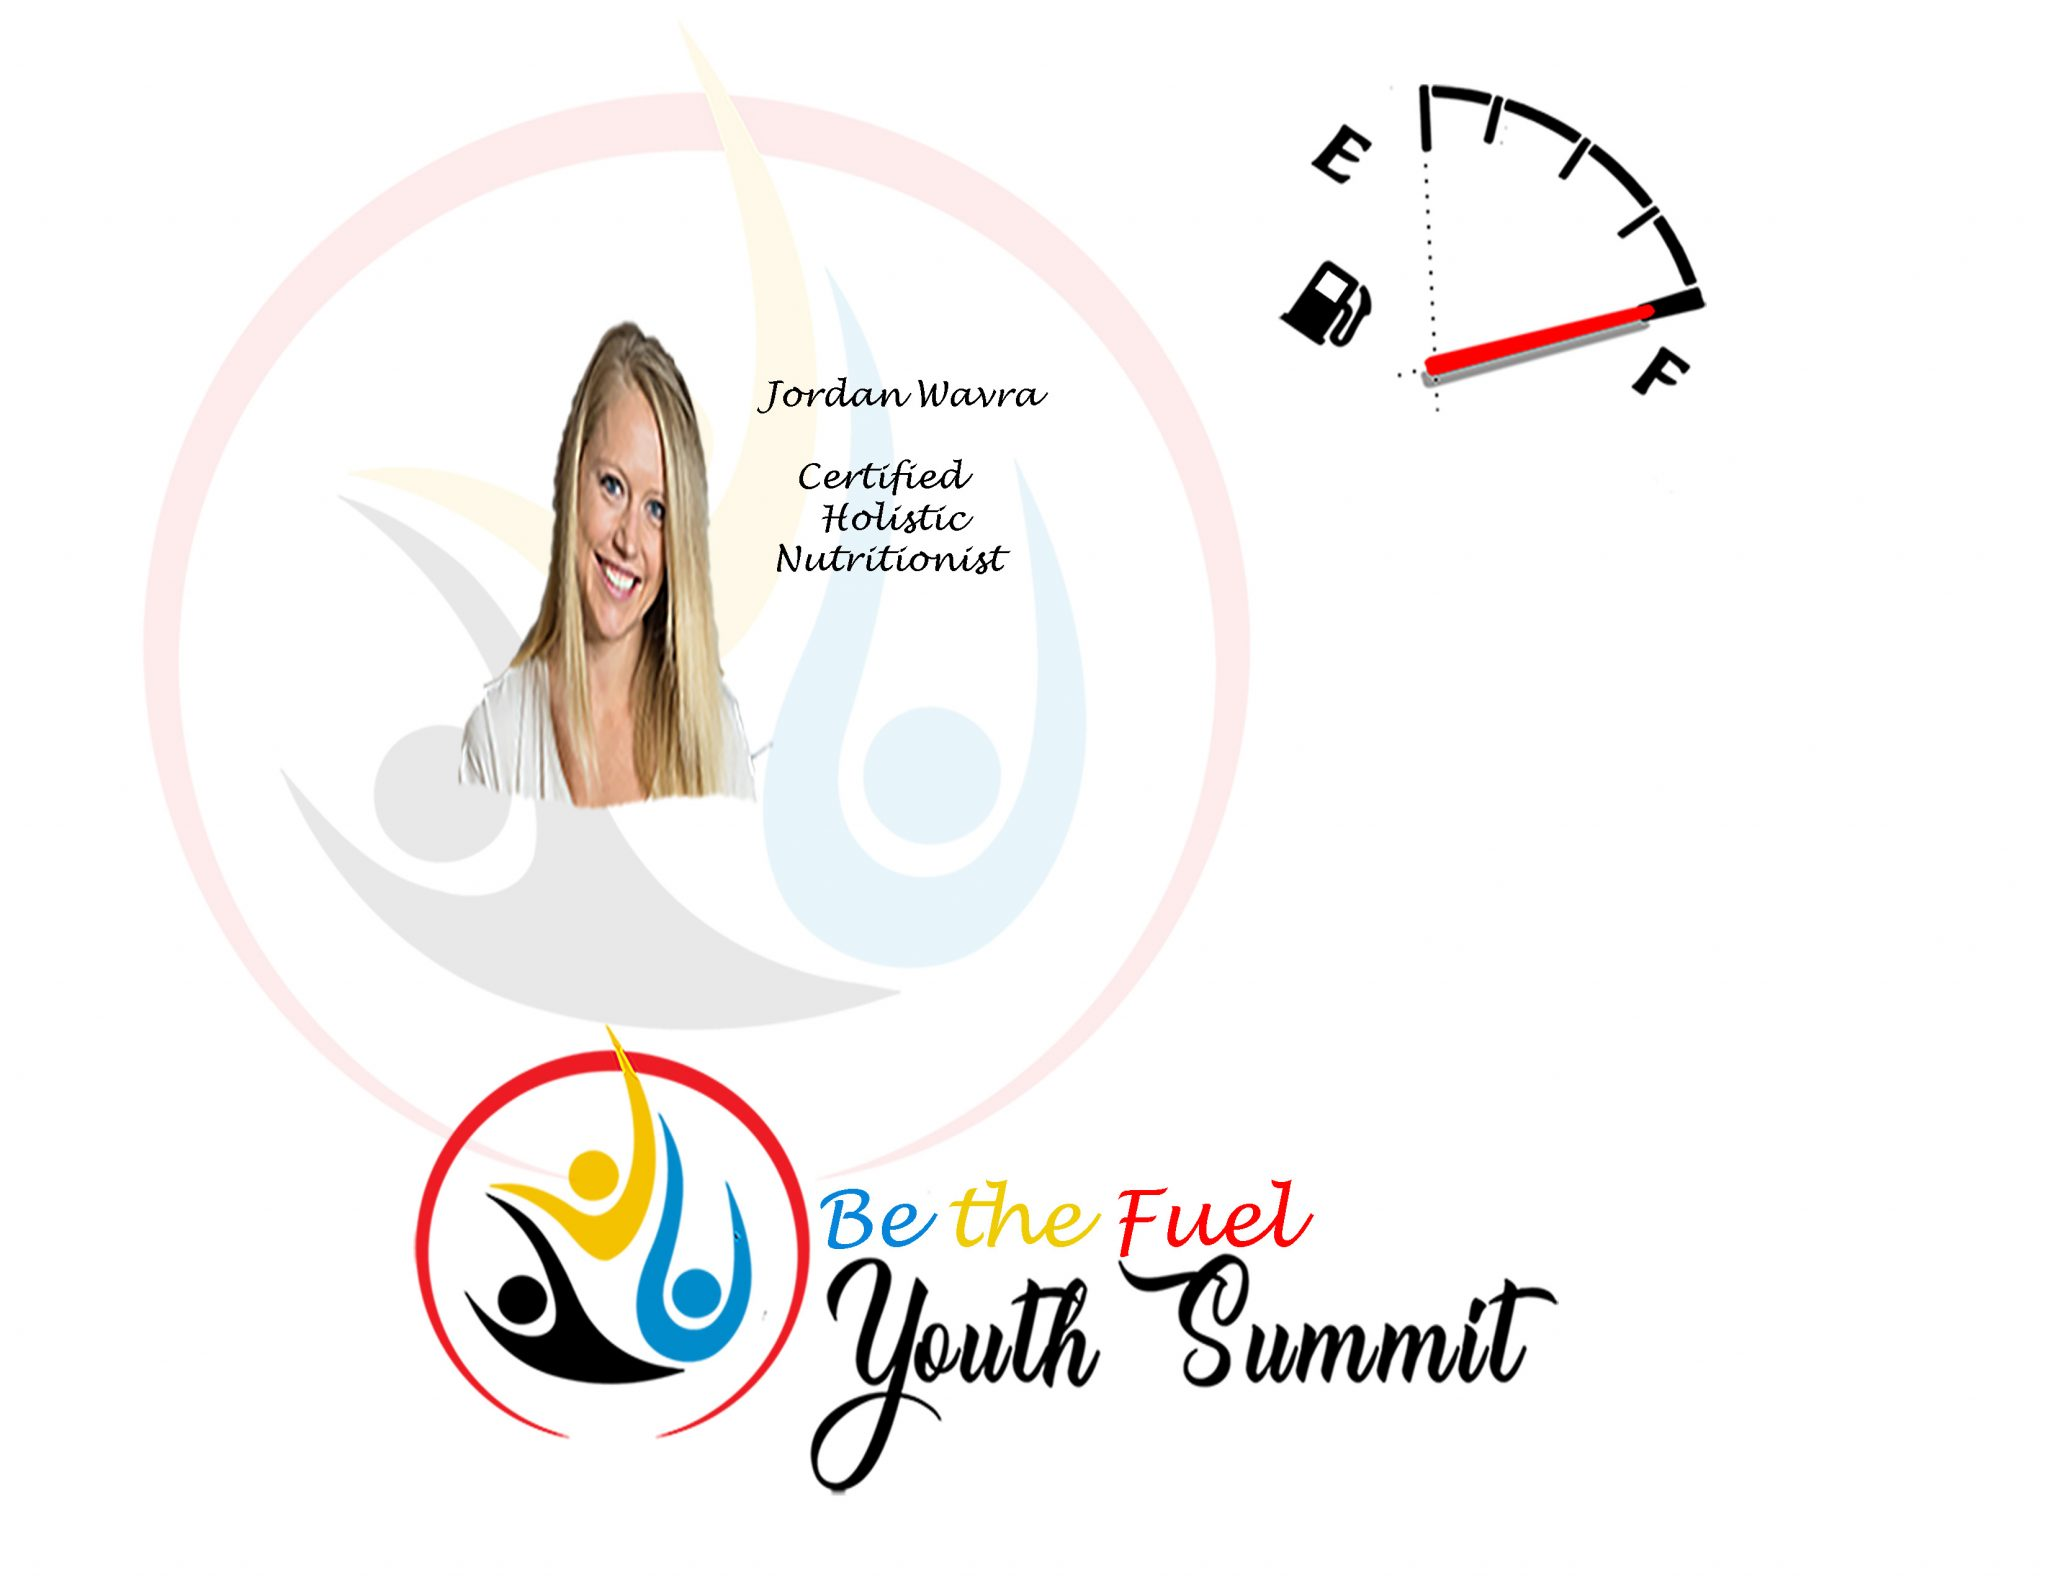 Jordan Wevra Youth Summit